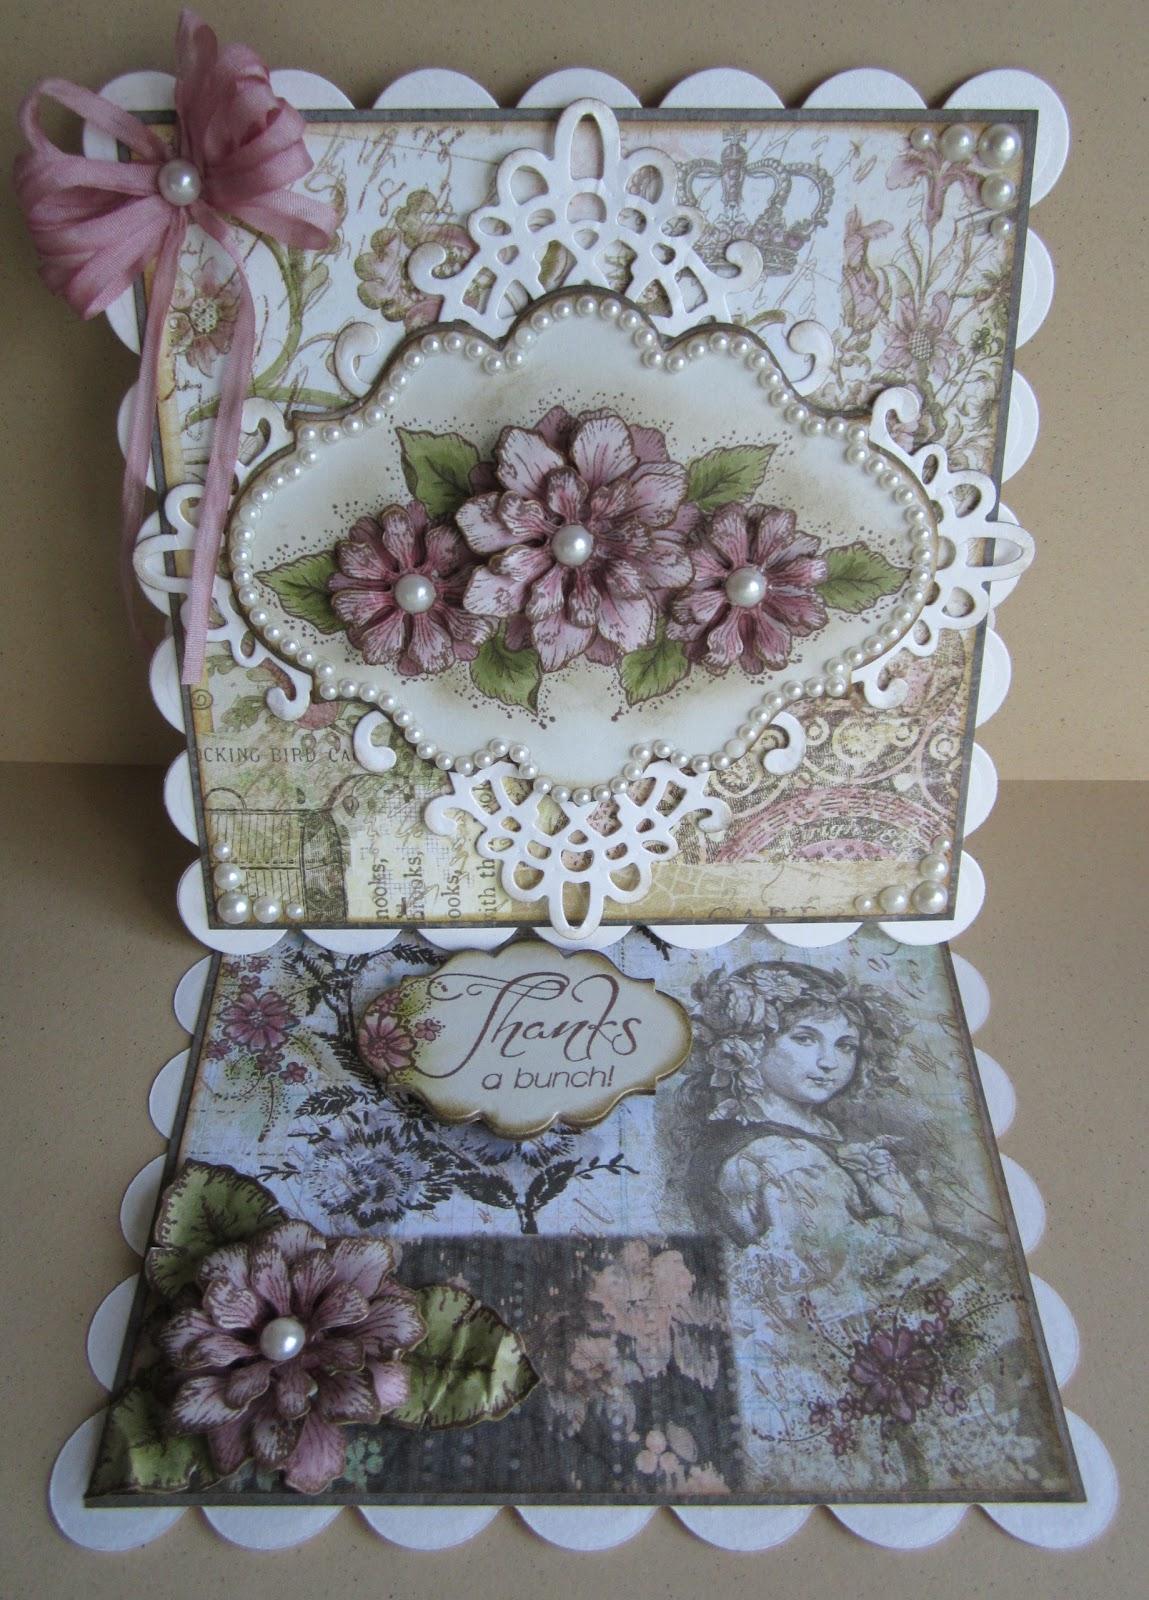 Designs by Marisa: Heartfelt Creations Thanks a Bunch